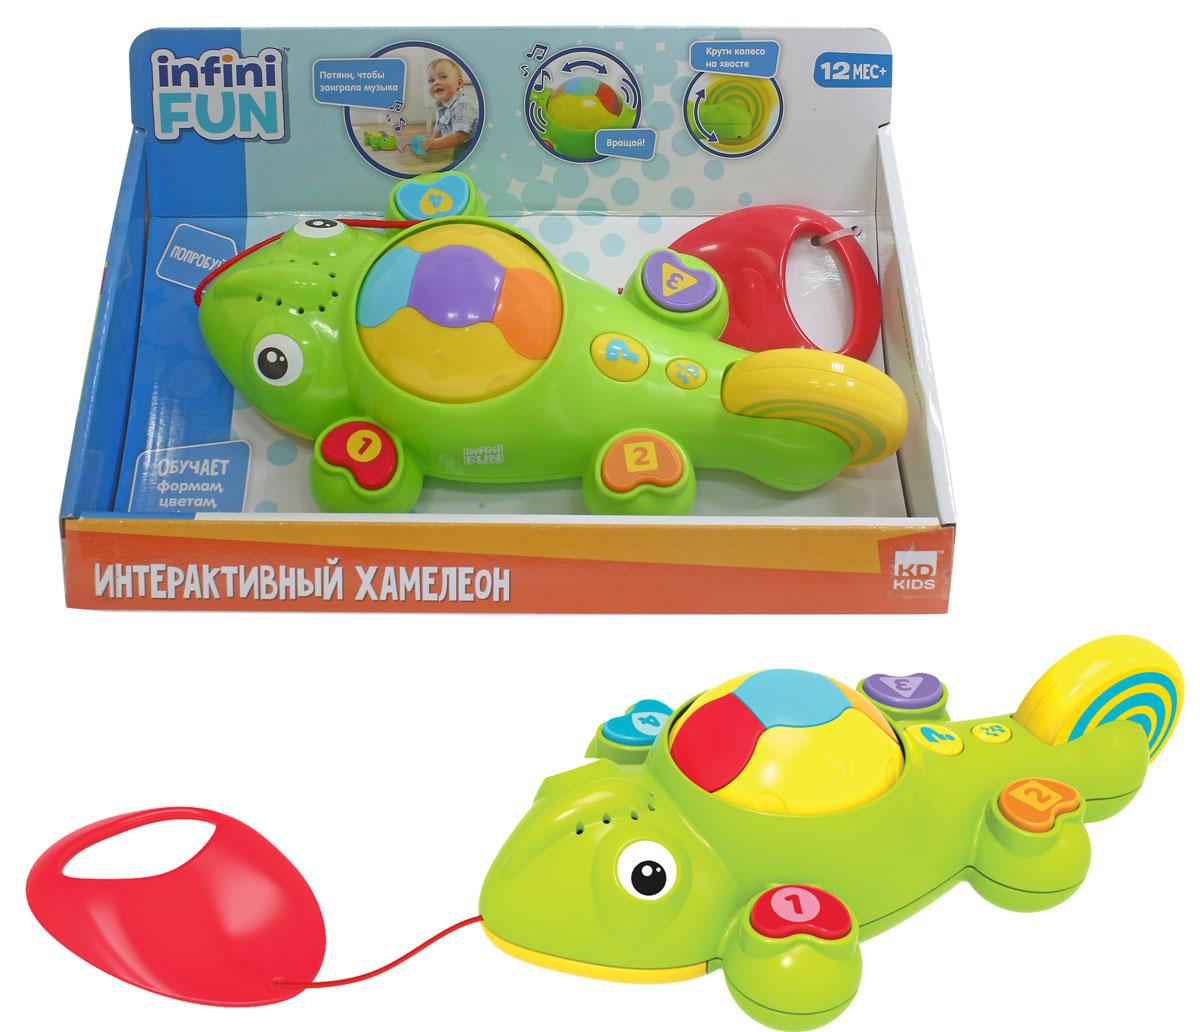 1TOY Игрушка-каталка Kidz Delight Интерактивный хамелеон смартфон 1toy обучающий kidz delight i lol